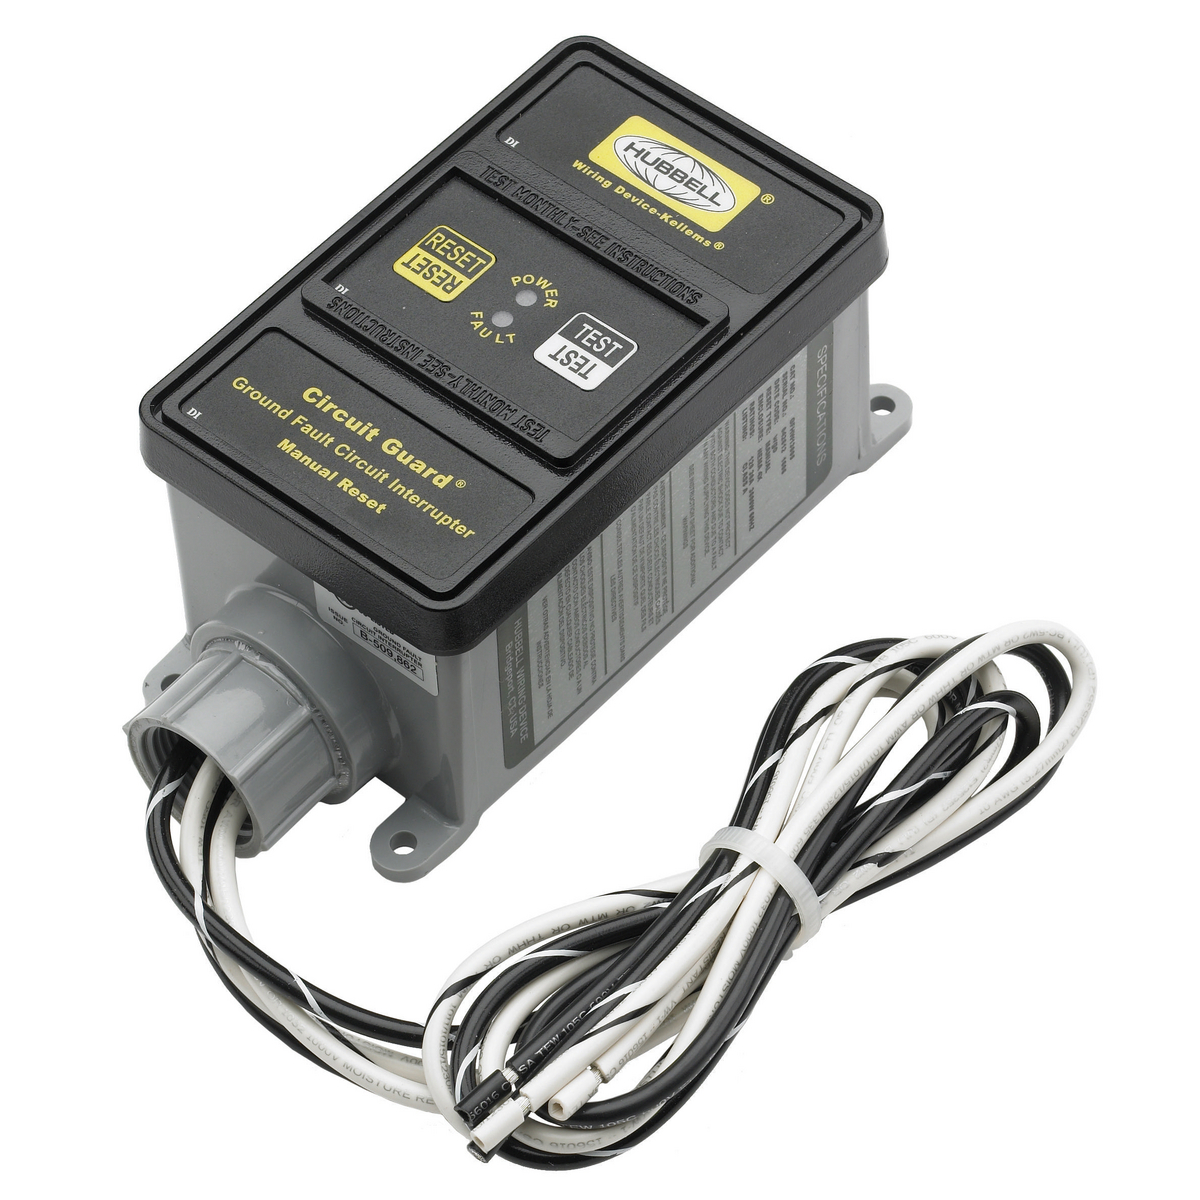 GFHW430 | Brand | Wiring Device - Kellems